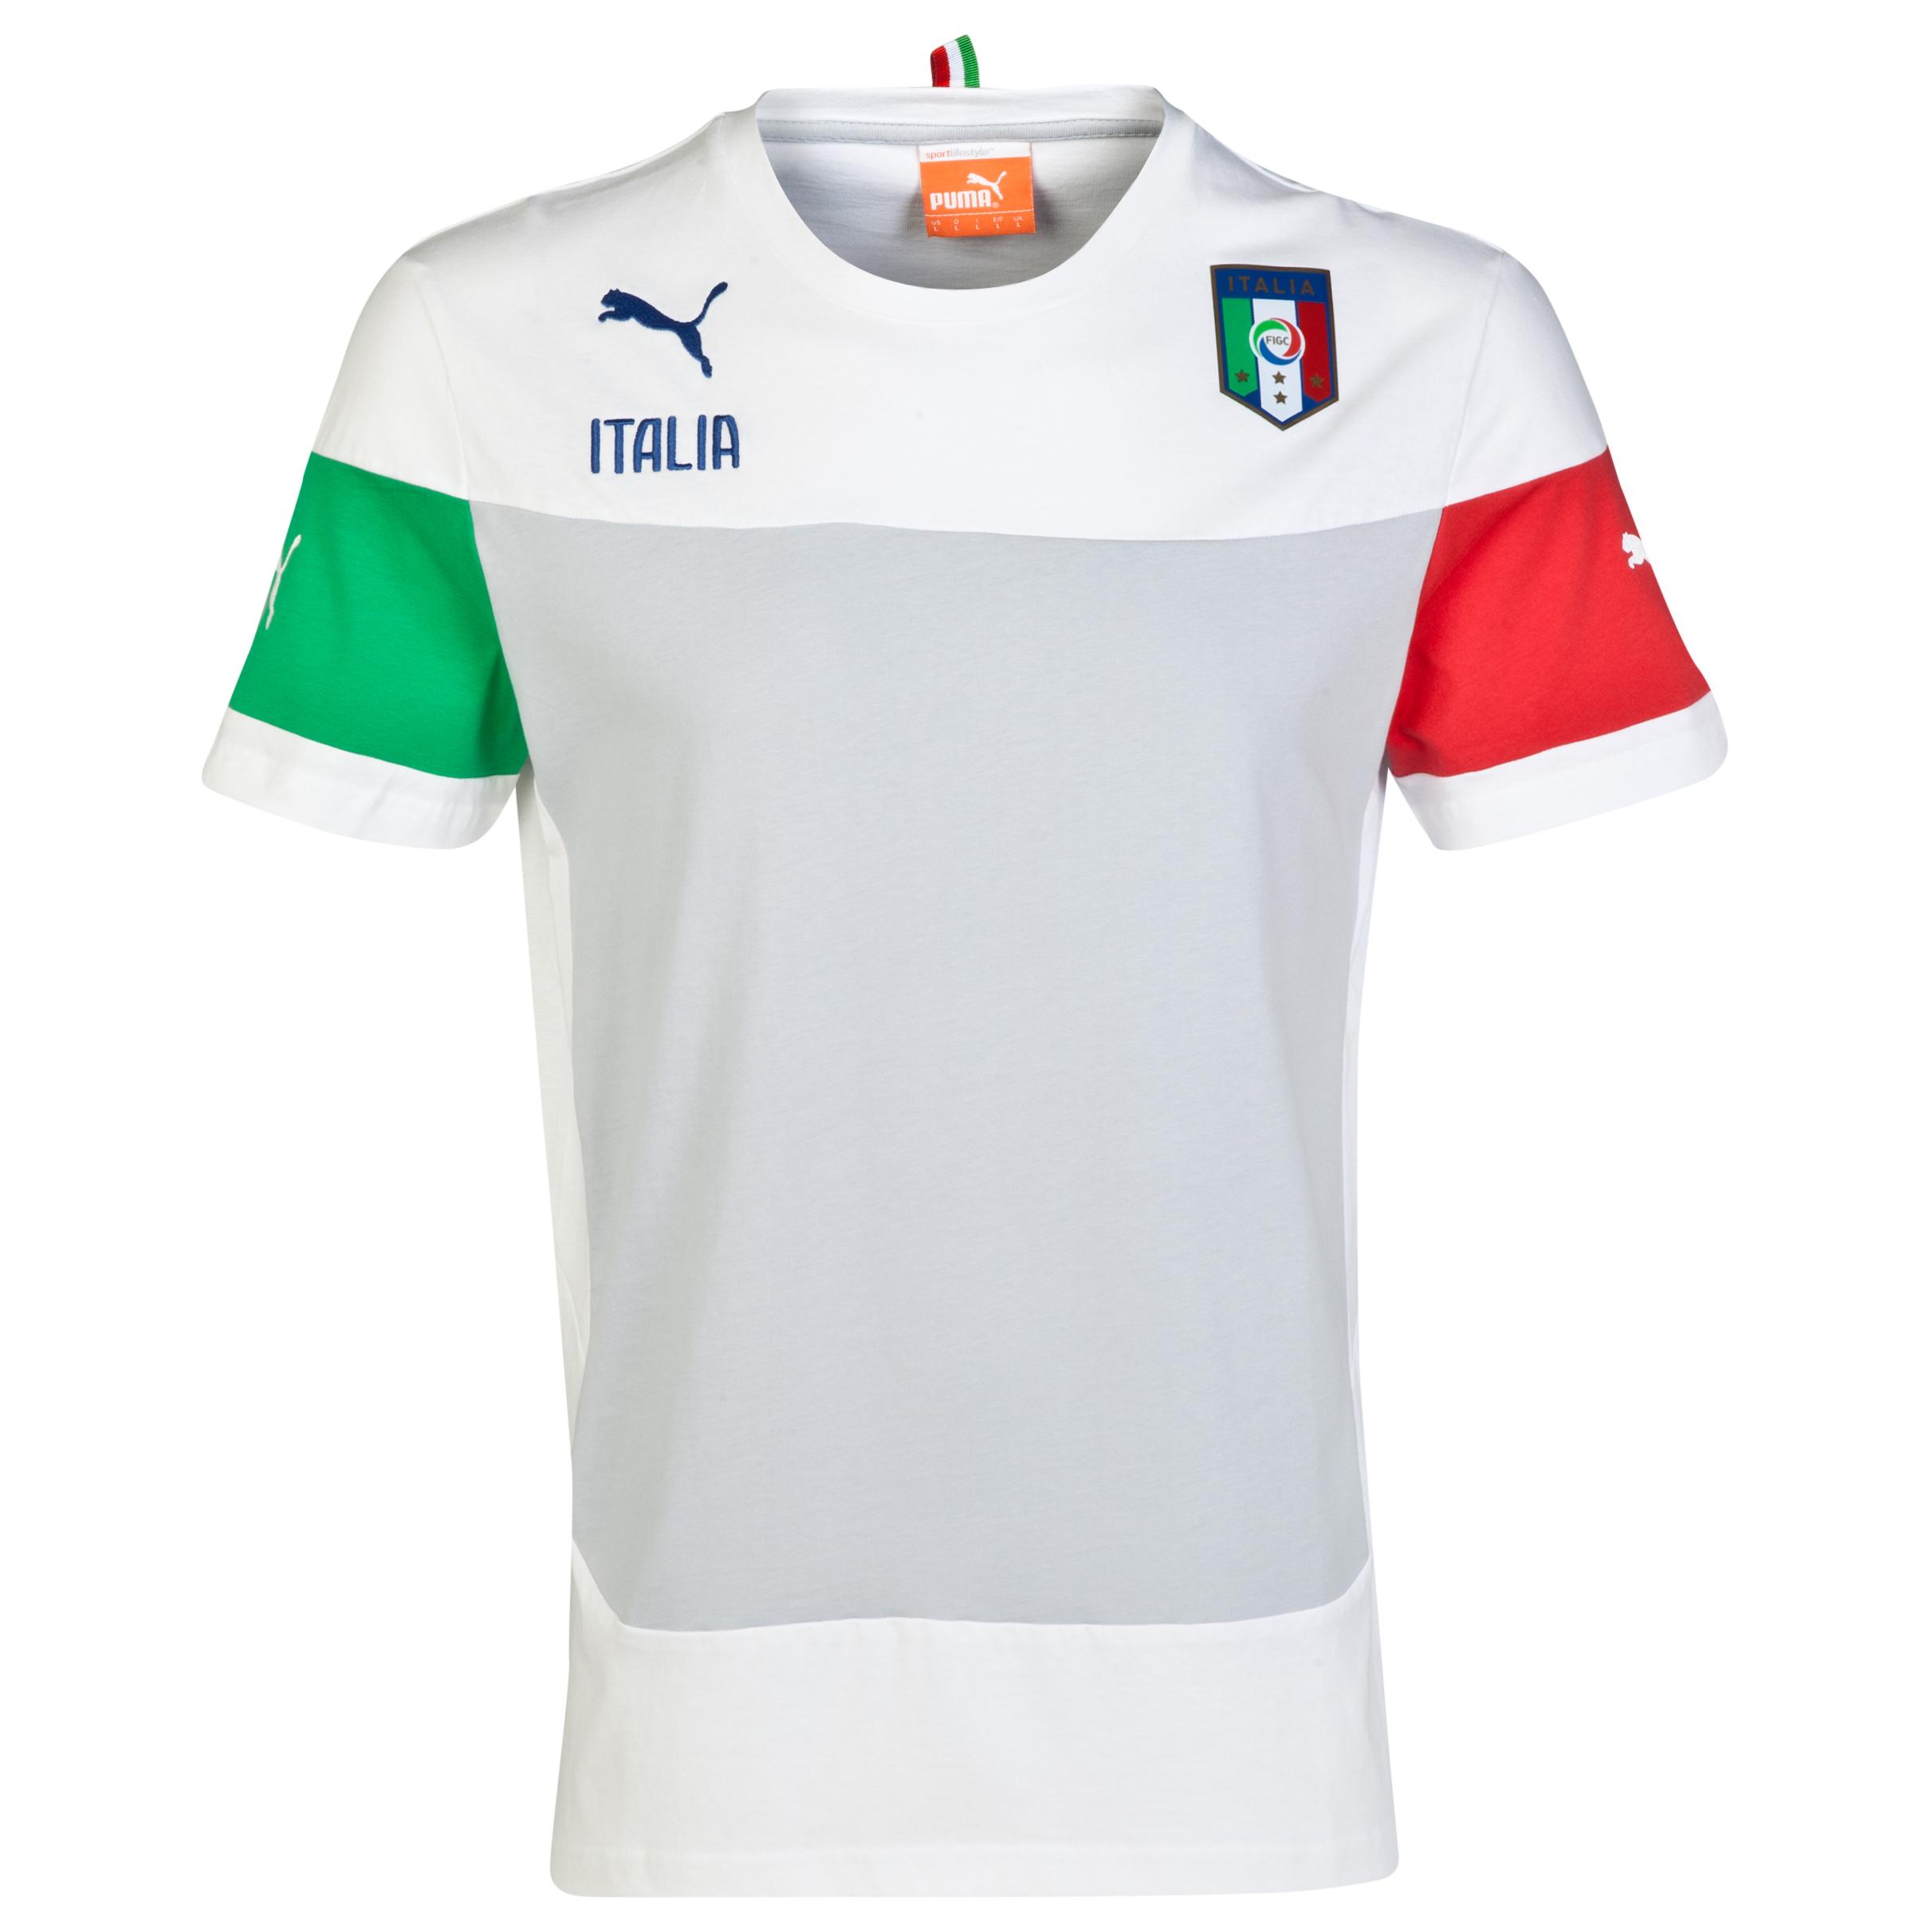 Italy Leisure T-Shirt - White